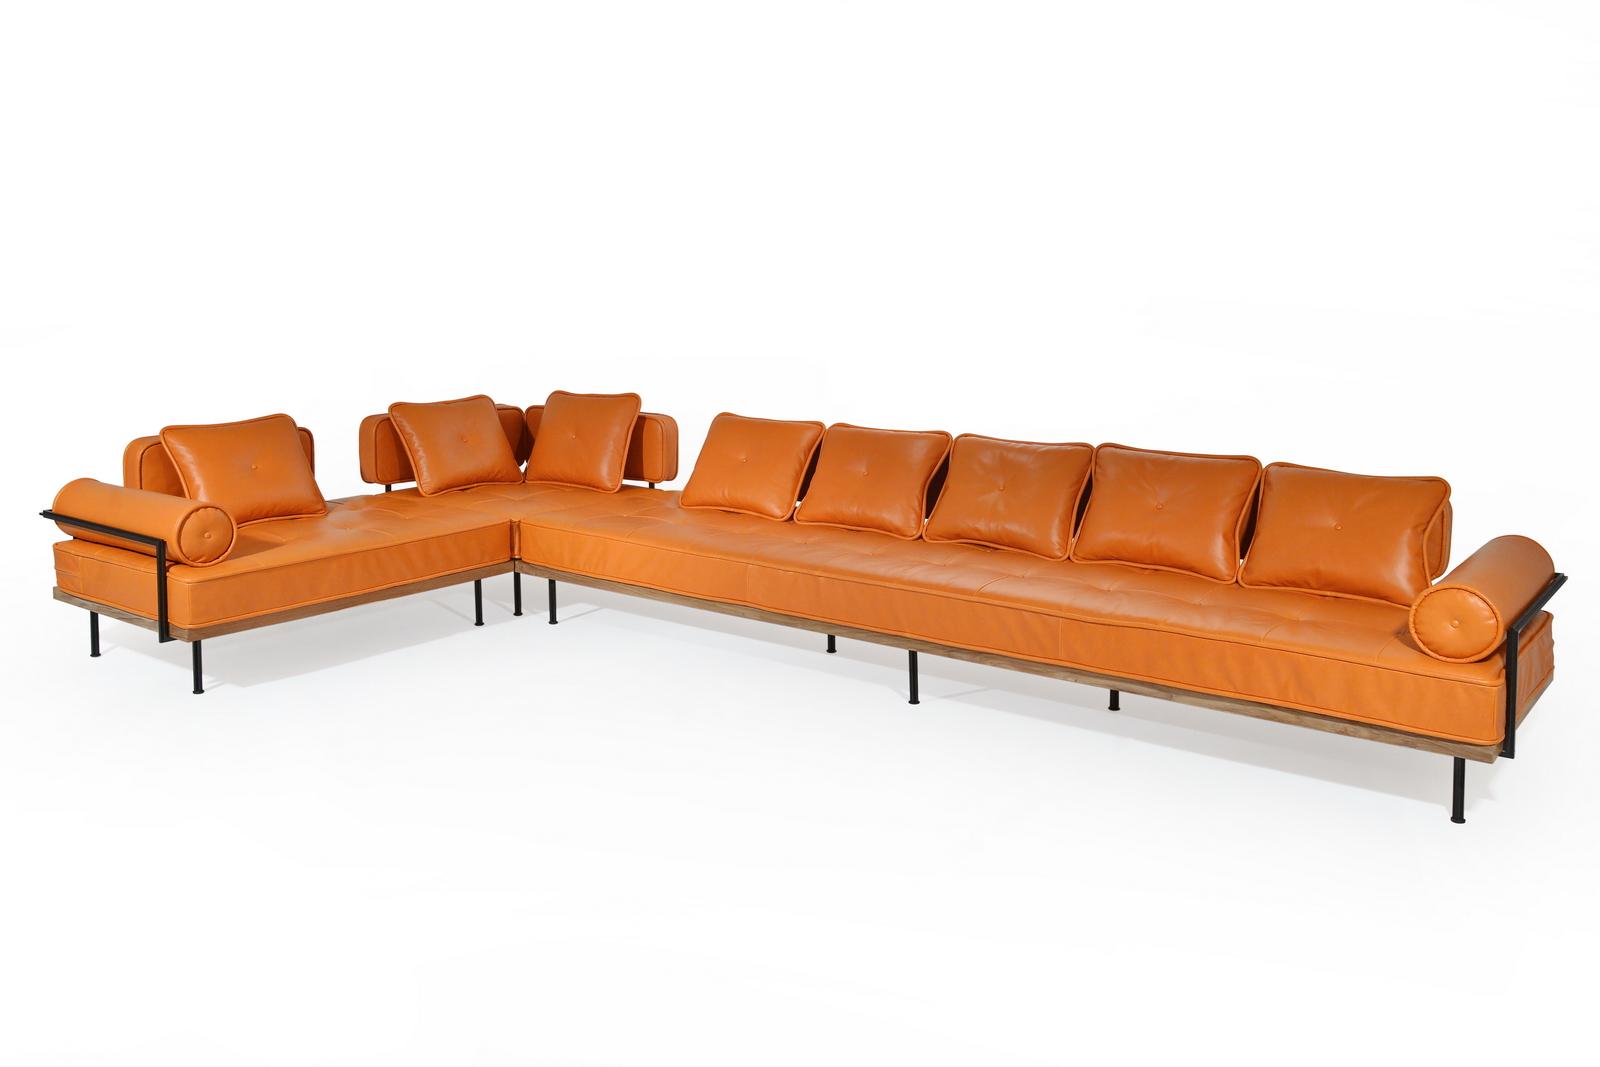 PTendercool-Sofa Corner-BS3-TE-BL-NO-Leather-210623-01